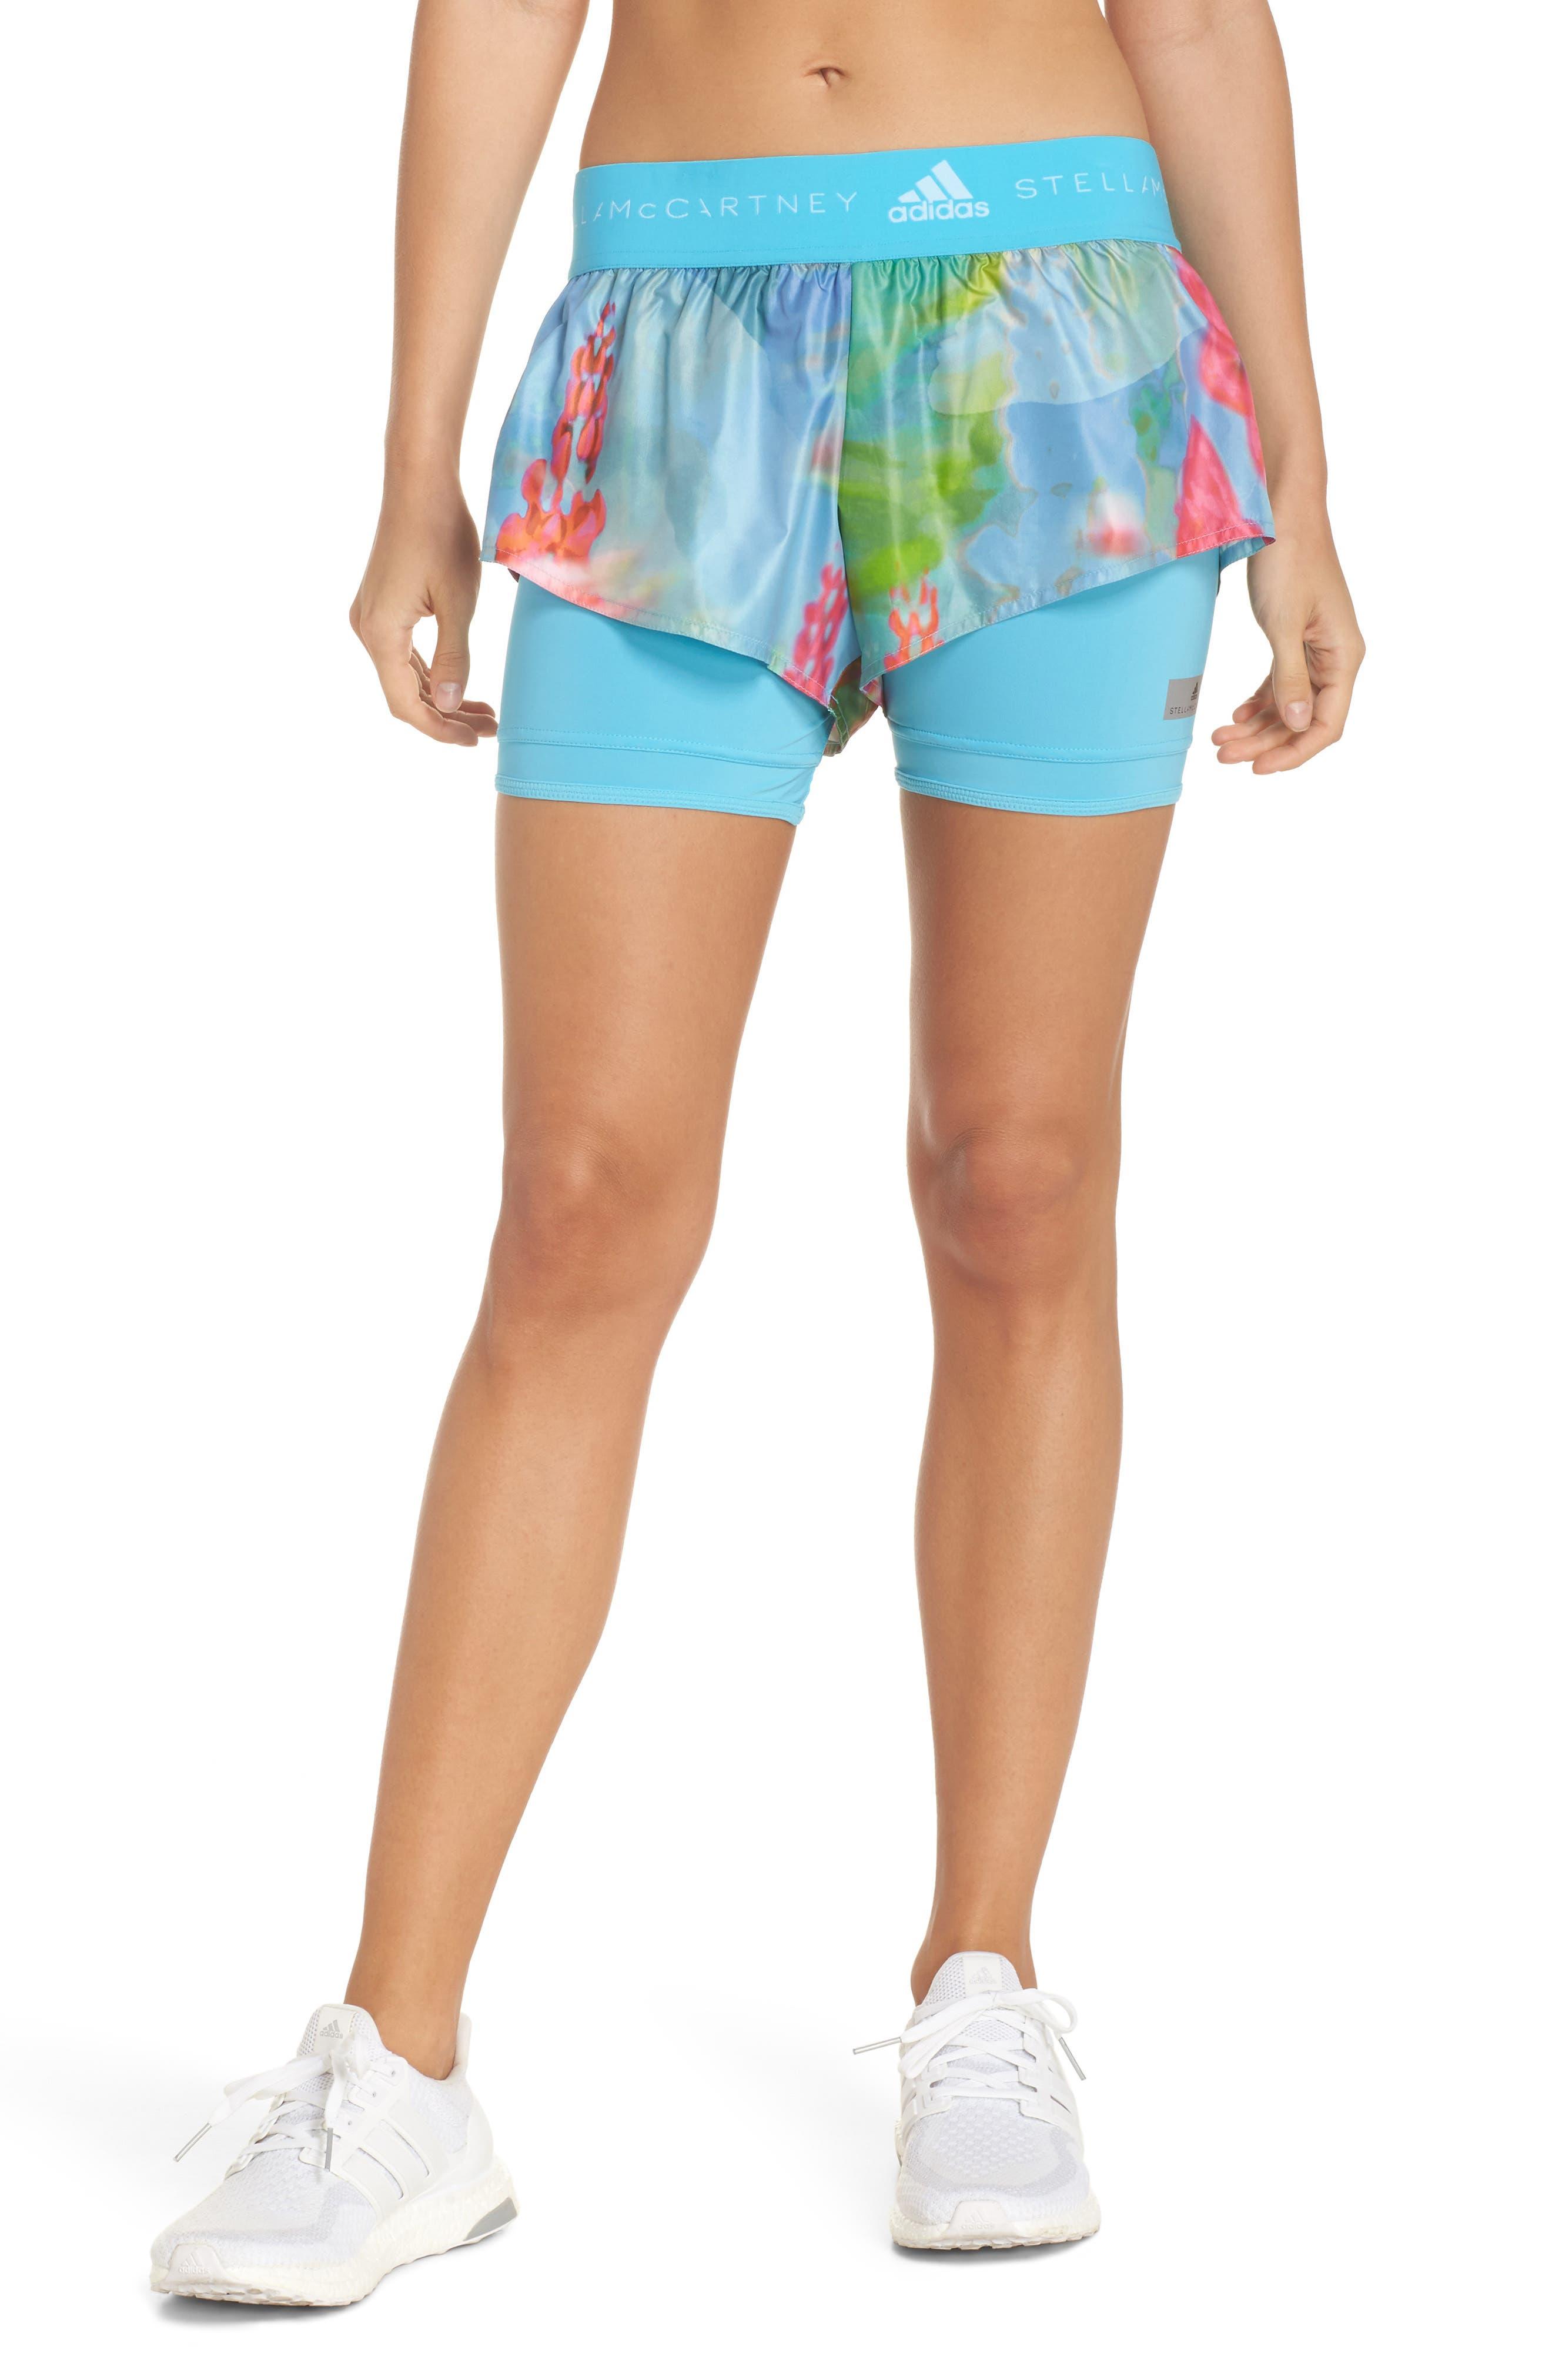 2-in-1 Run Shorts,                             Main thumbnail 1, color,                             Mirror Blue-Smc/ Multicolor